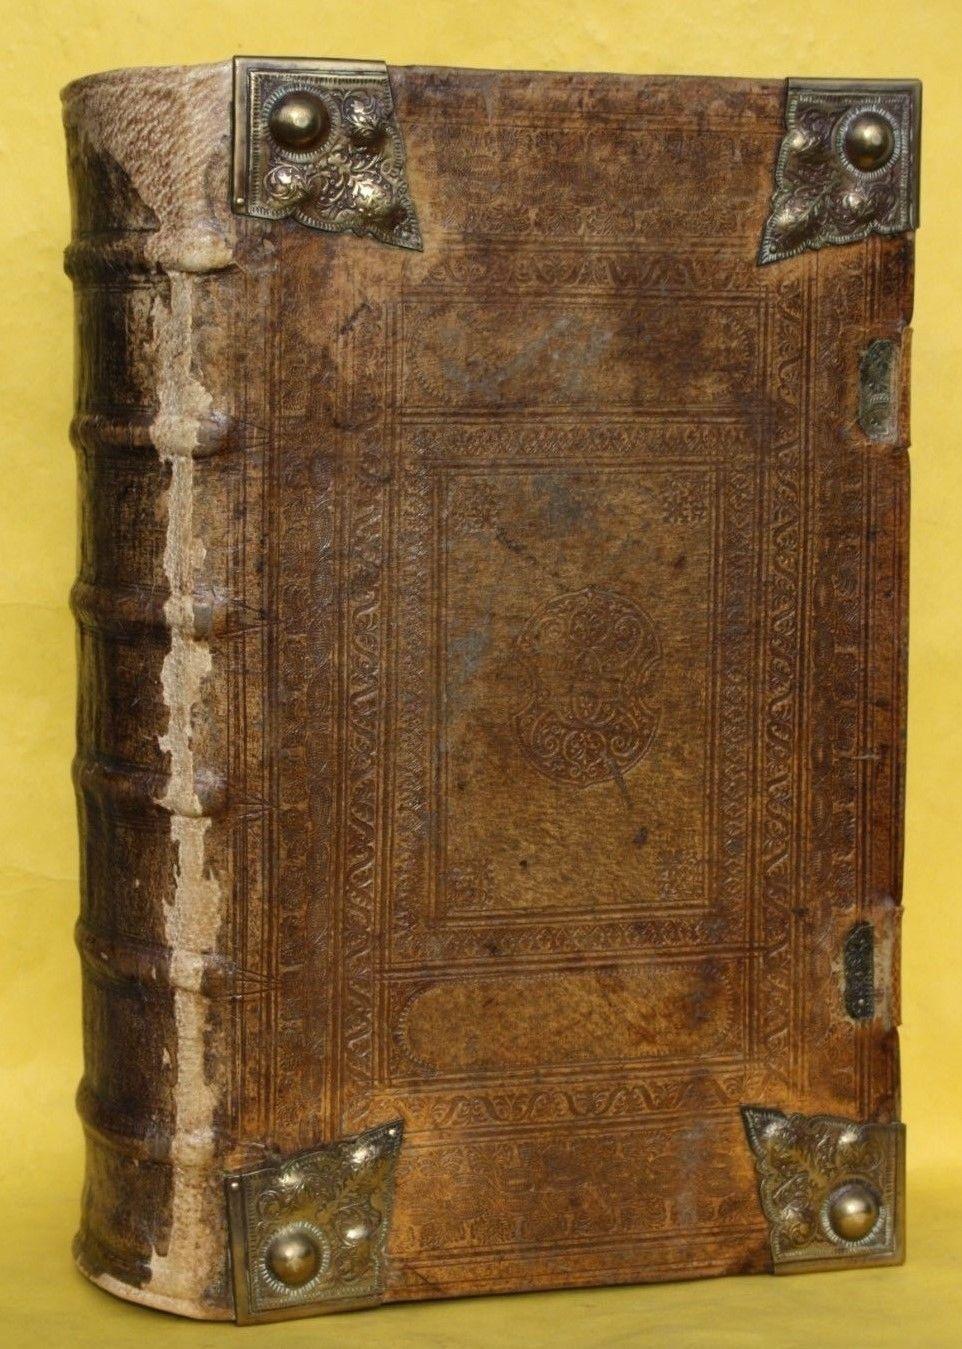 TABERNAEMONTANUS,NEW VOLLKOMMEN KRÄUTER-BUCH,2400 TEXTHOLZSCHNITTE,1664,RAR